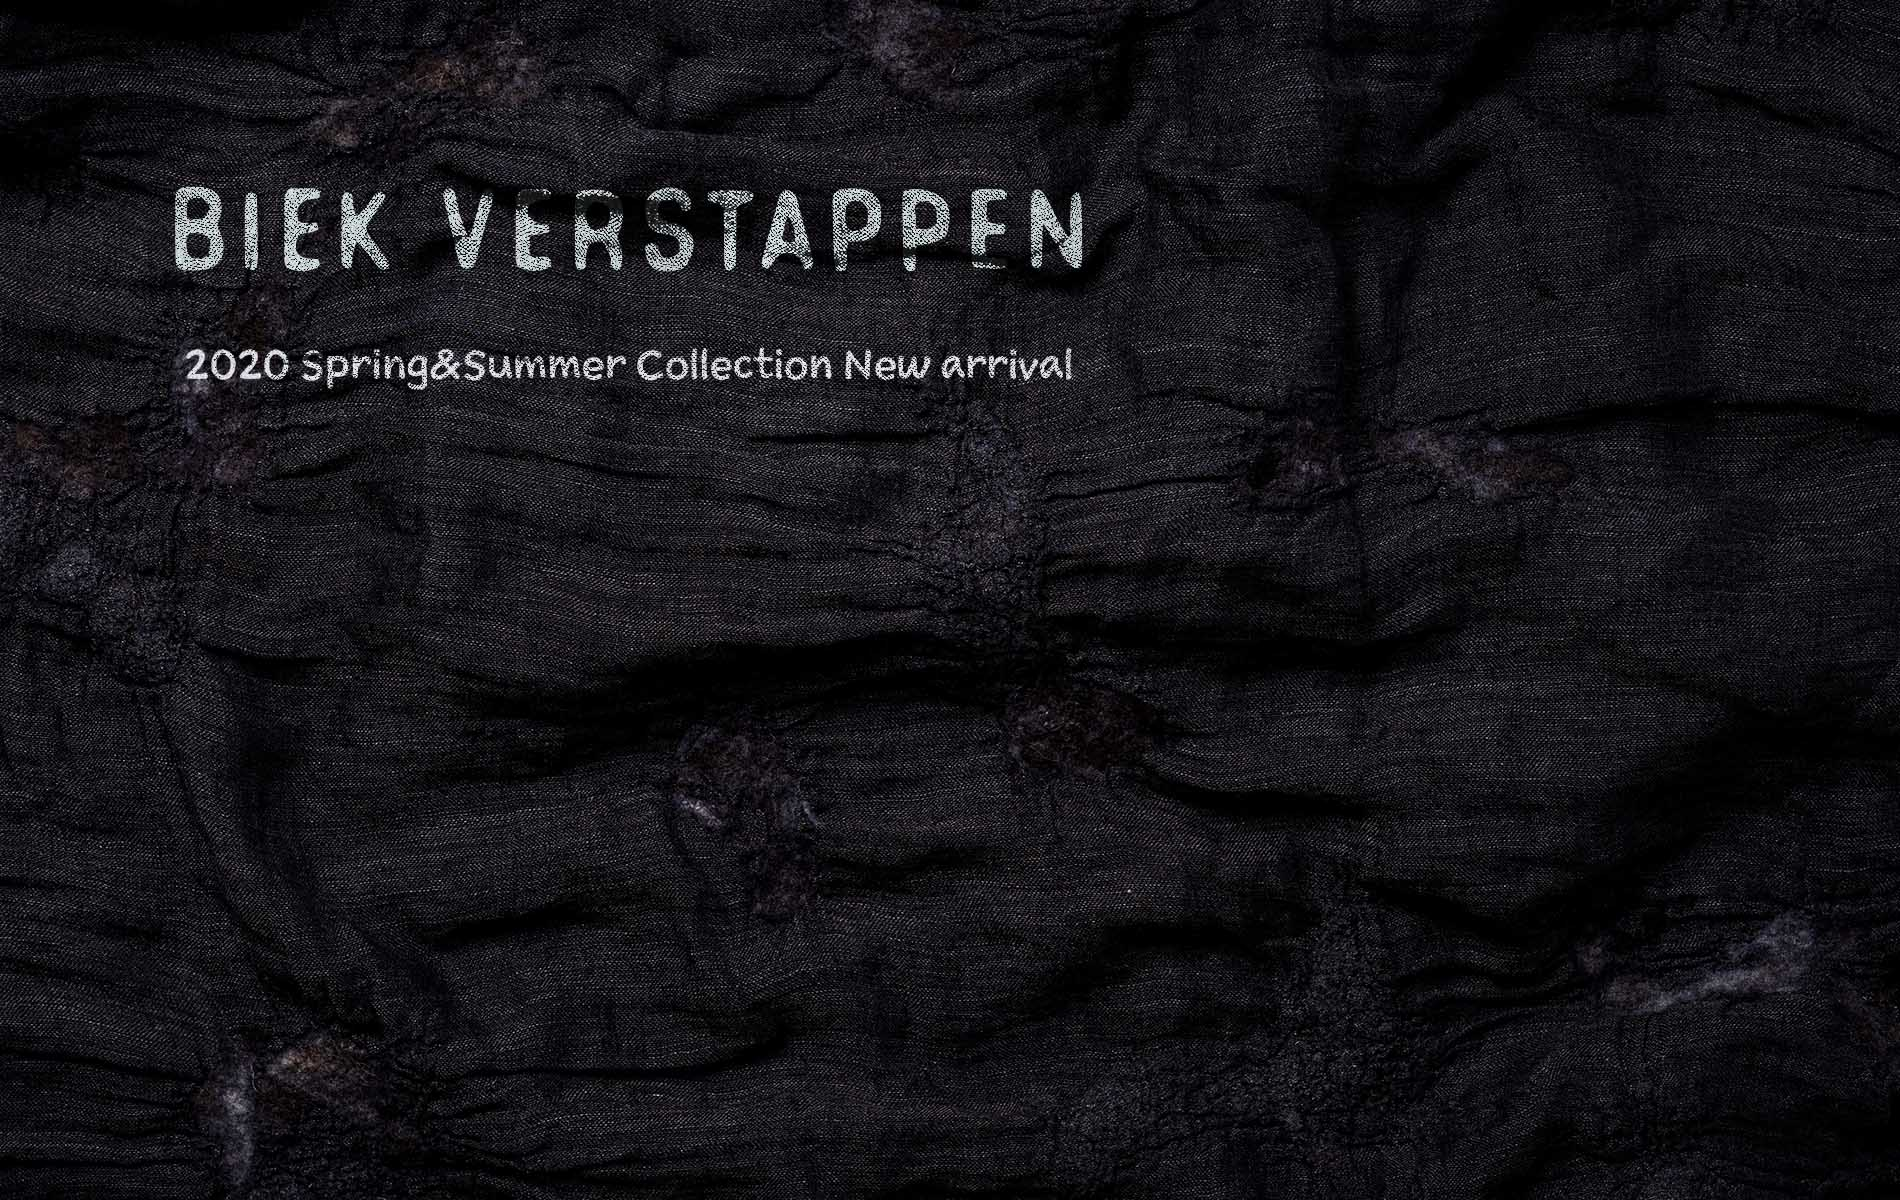 Biek Verstappen  2020SPRING&SUMMER Release Start